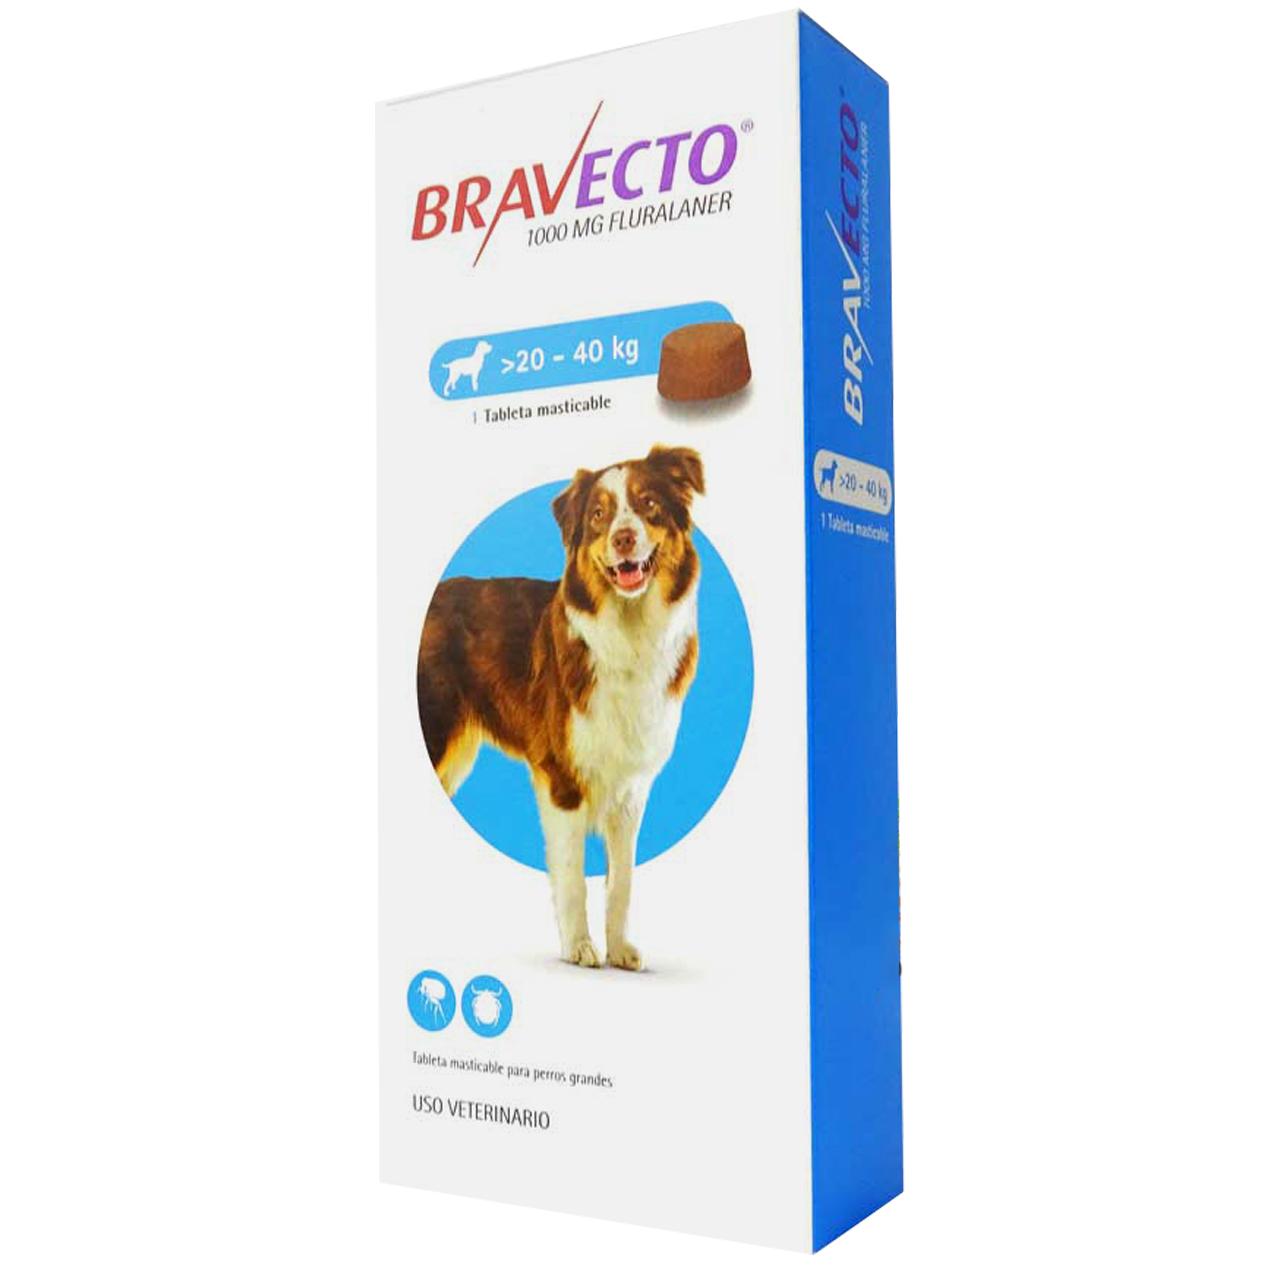 Bravecto20.jpg